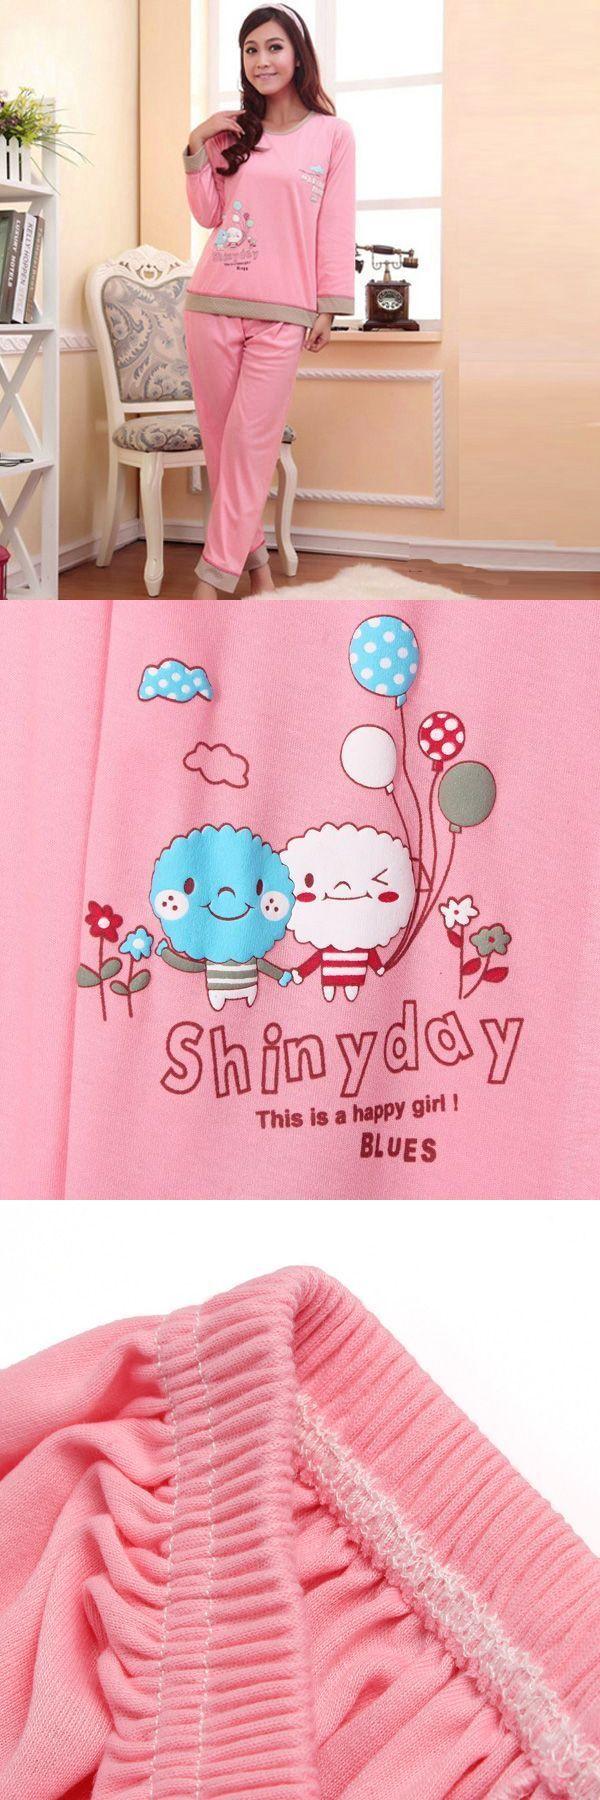 Dillards sleepwear robes long sleeve pink cute cartoon shirt pants pajama set sleepwear #jcpenney #robes #sleepwear #maternity #sleepwear #and #robes #petite #sleepwear #and #robes #sleepwear #front #snap #robes